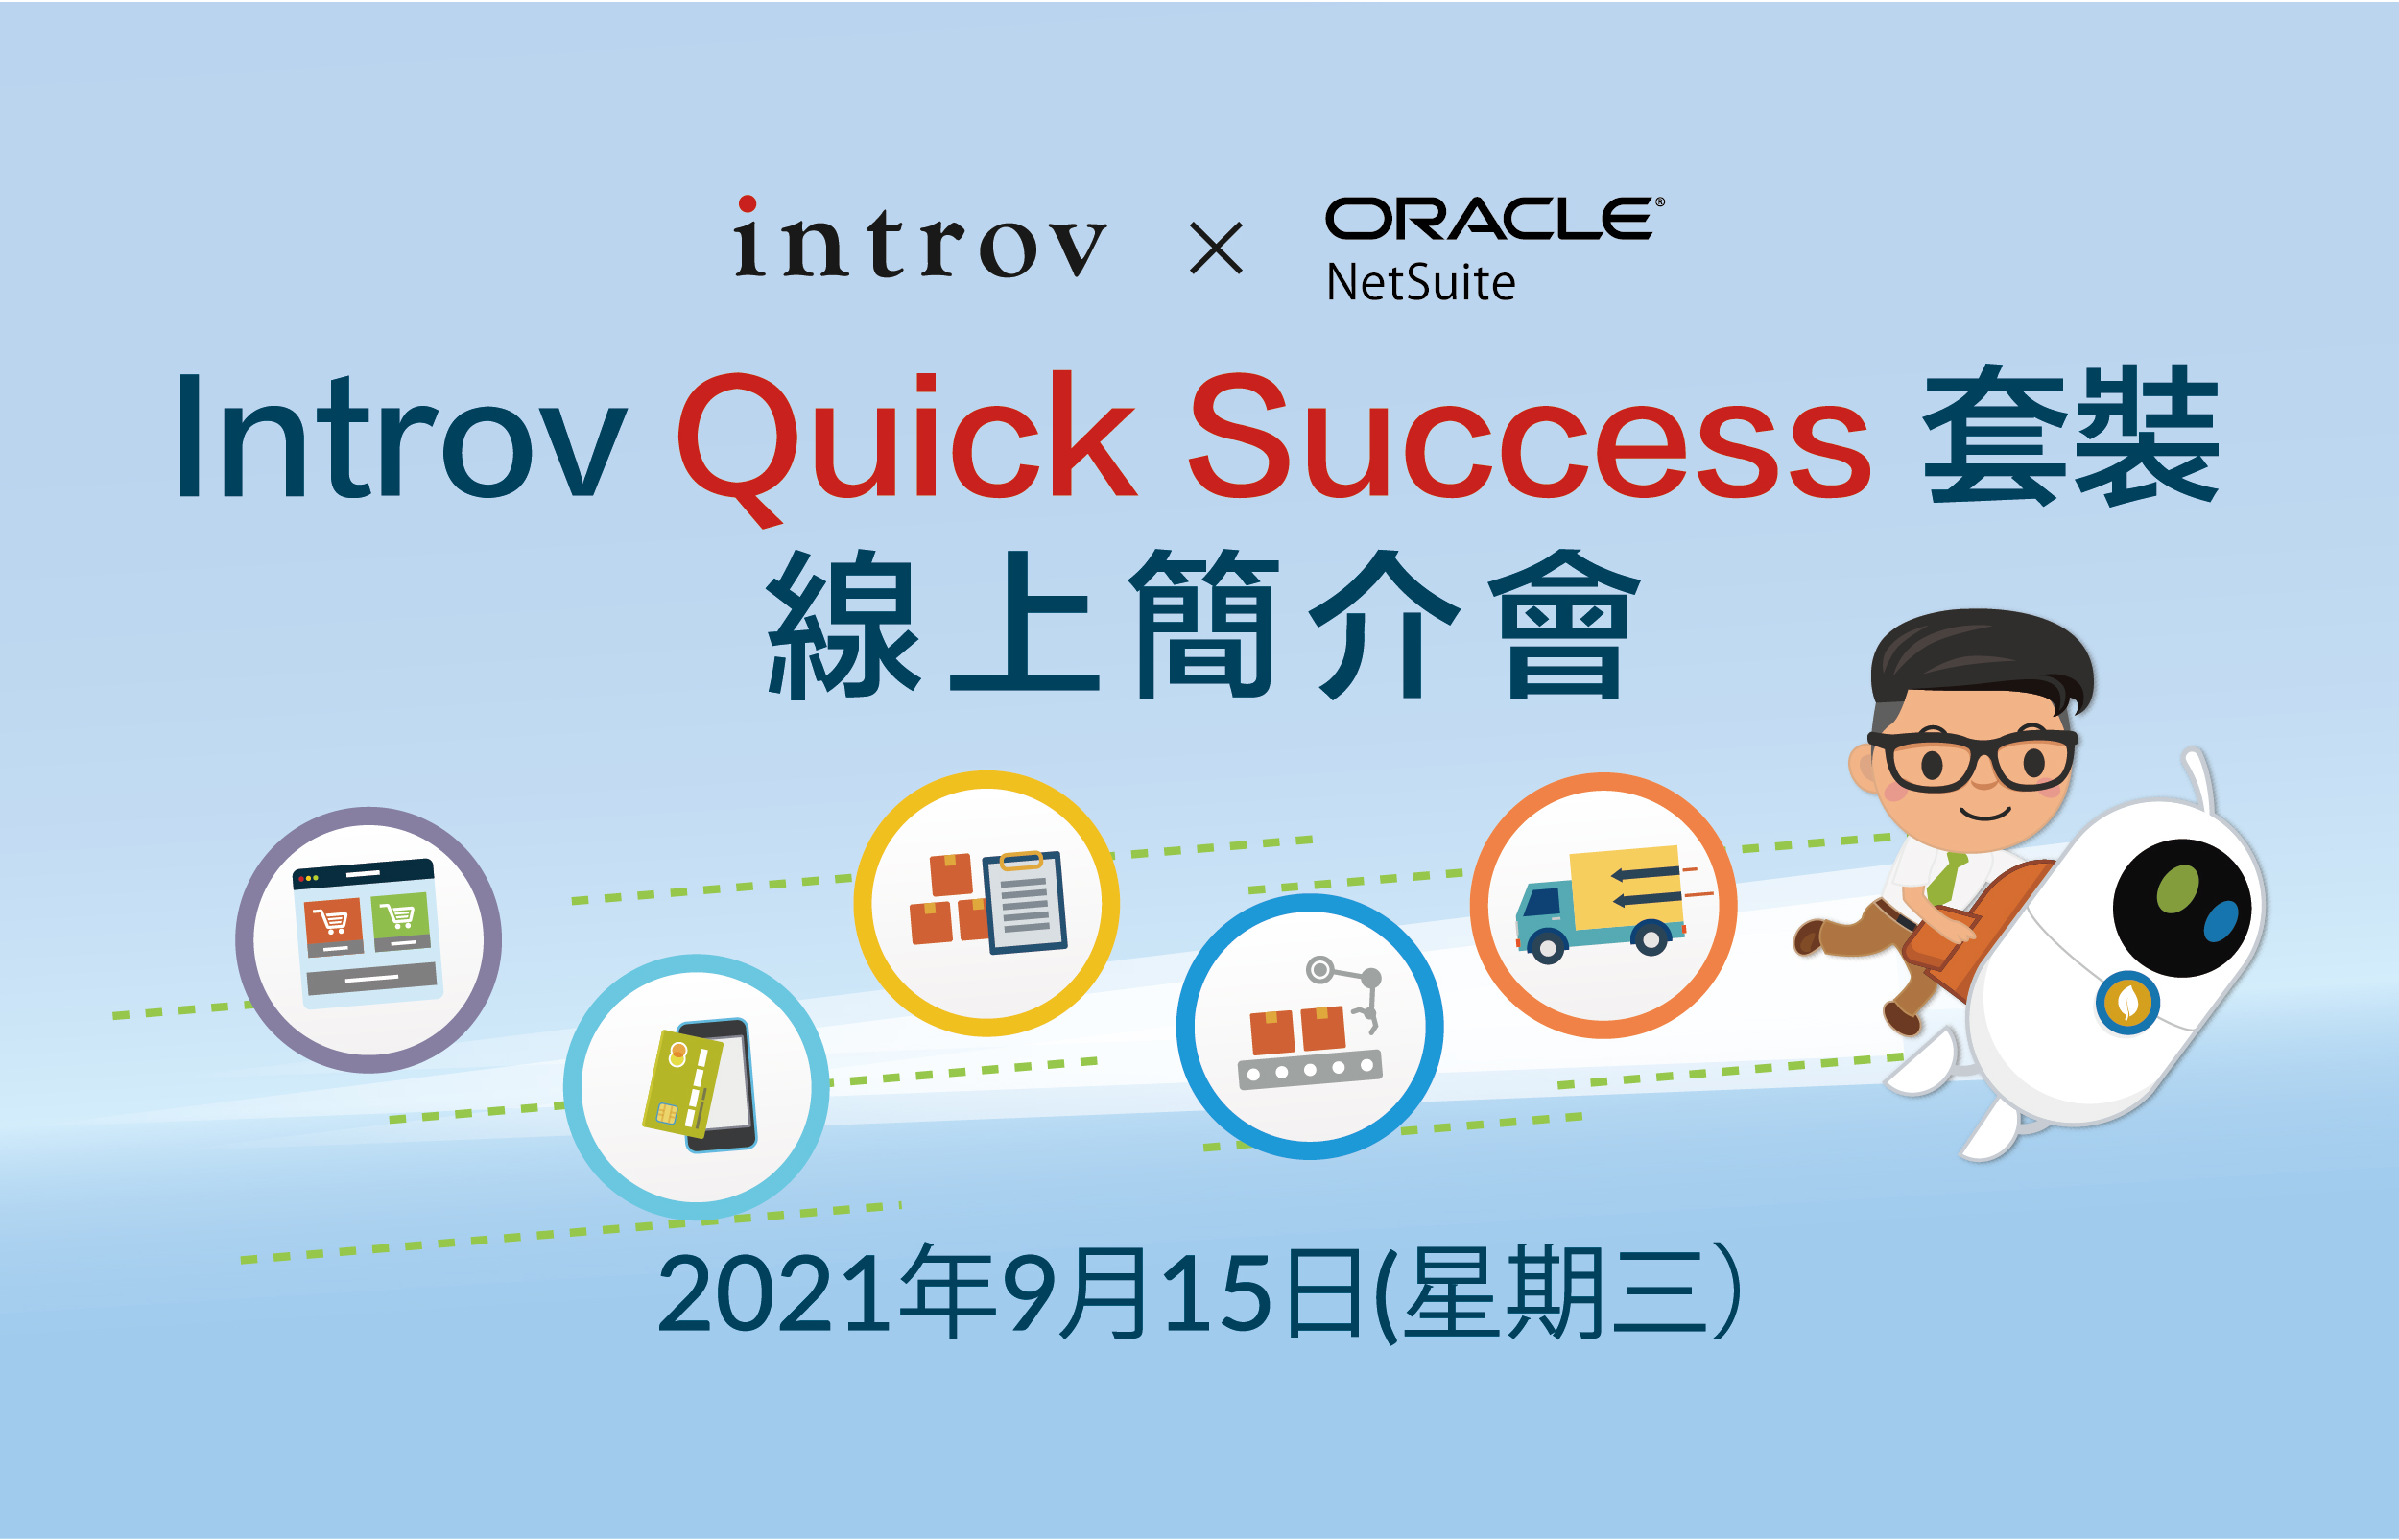 Introv Quick Success 套裝線上簡介會 (2021年9月15日)